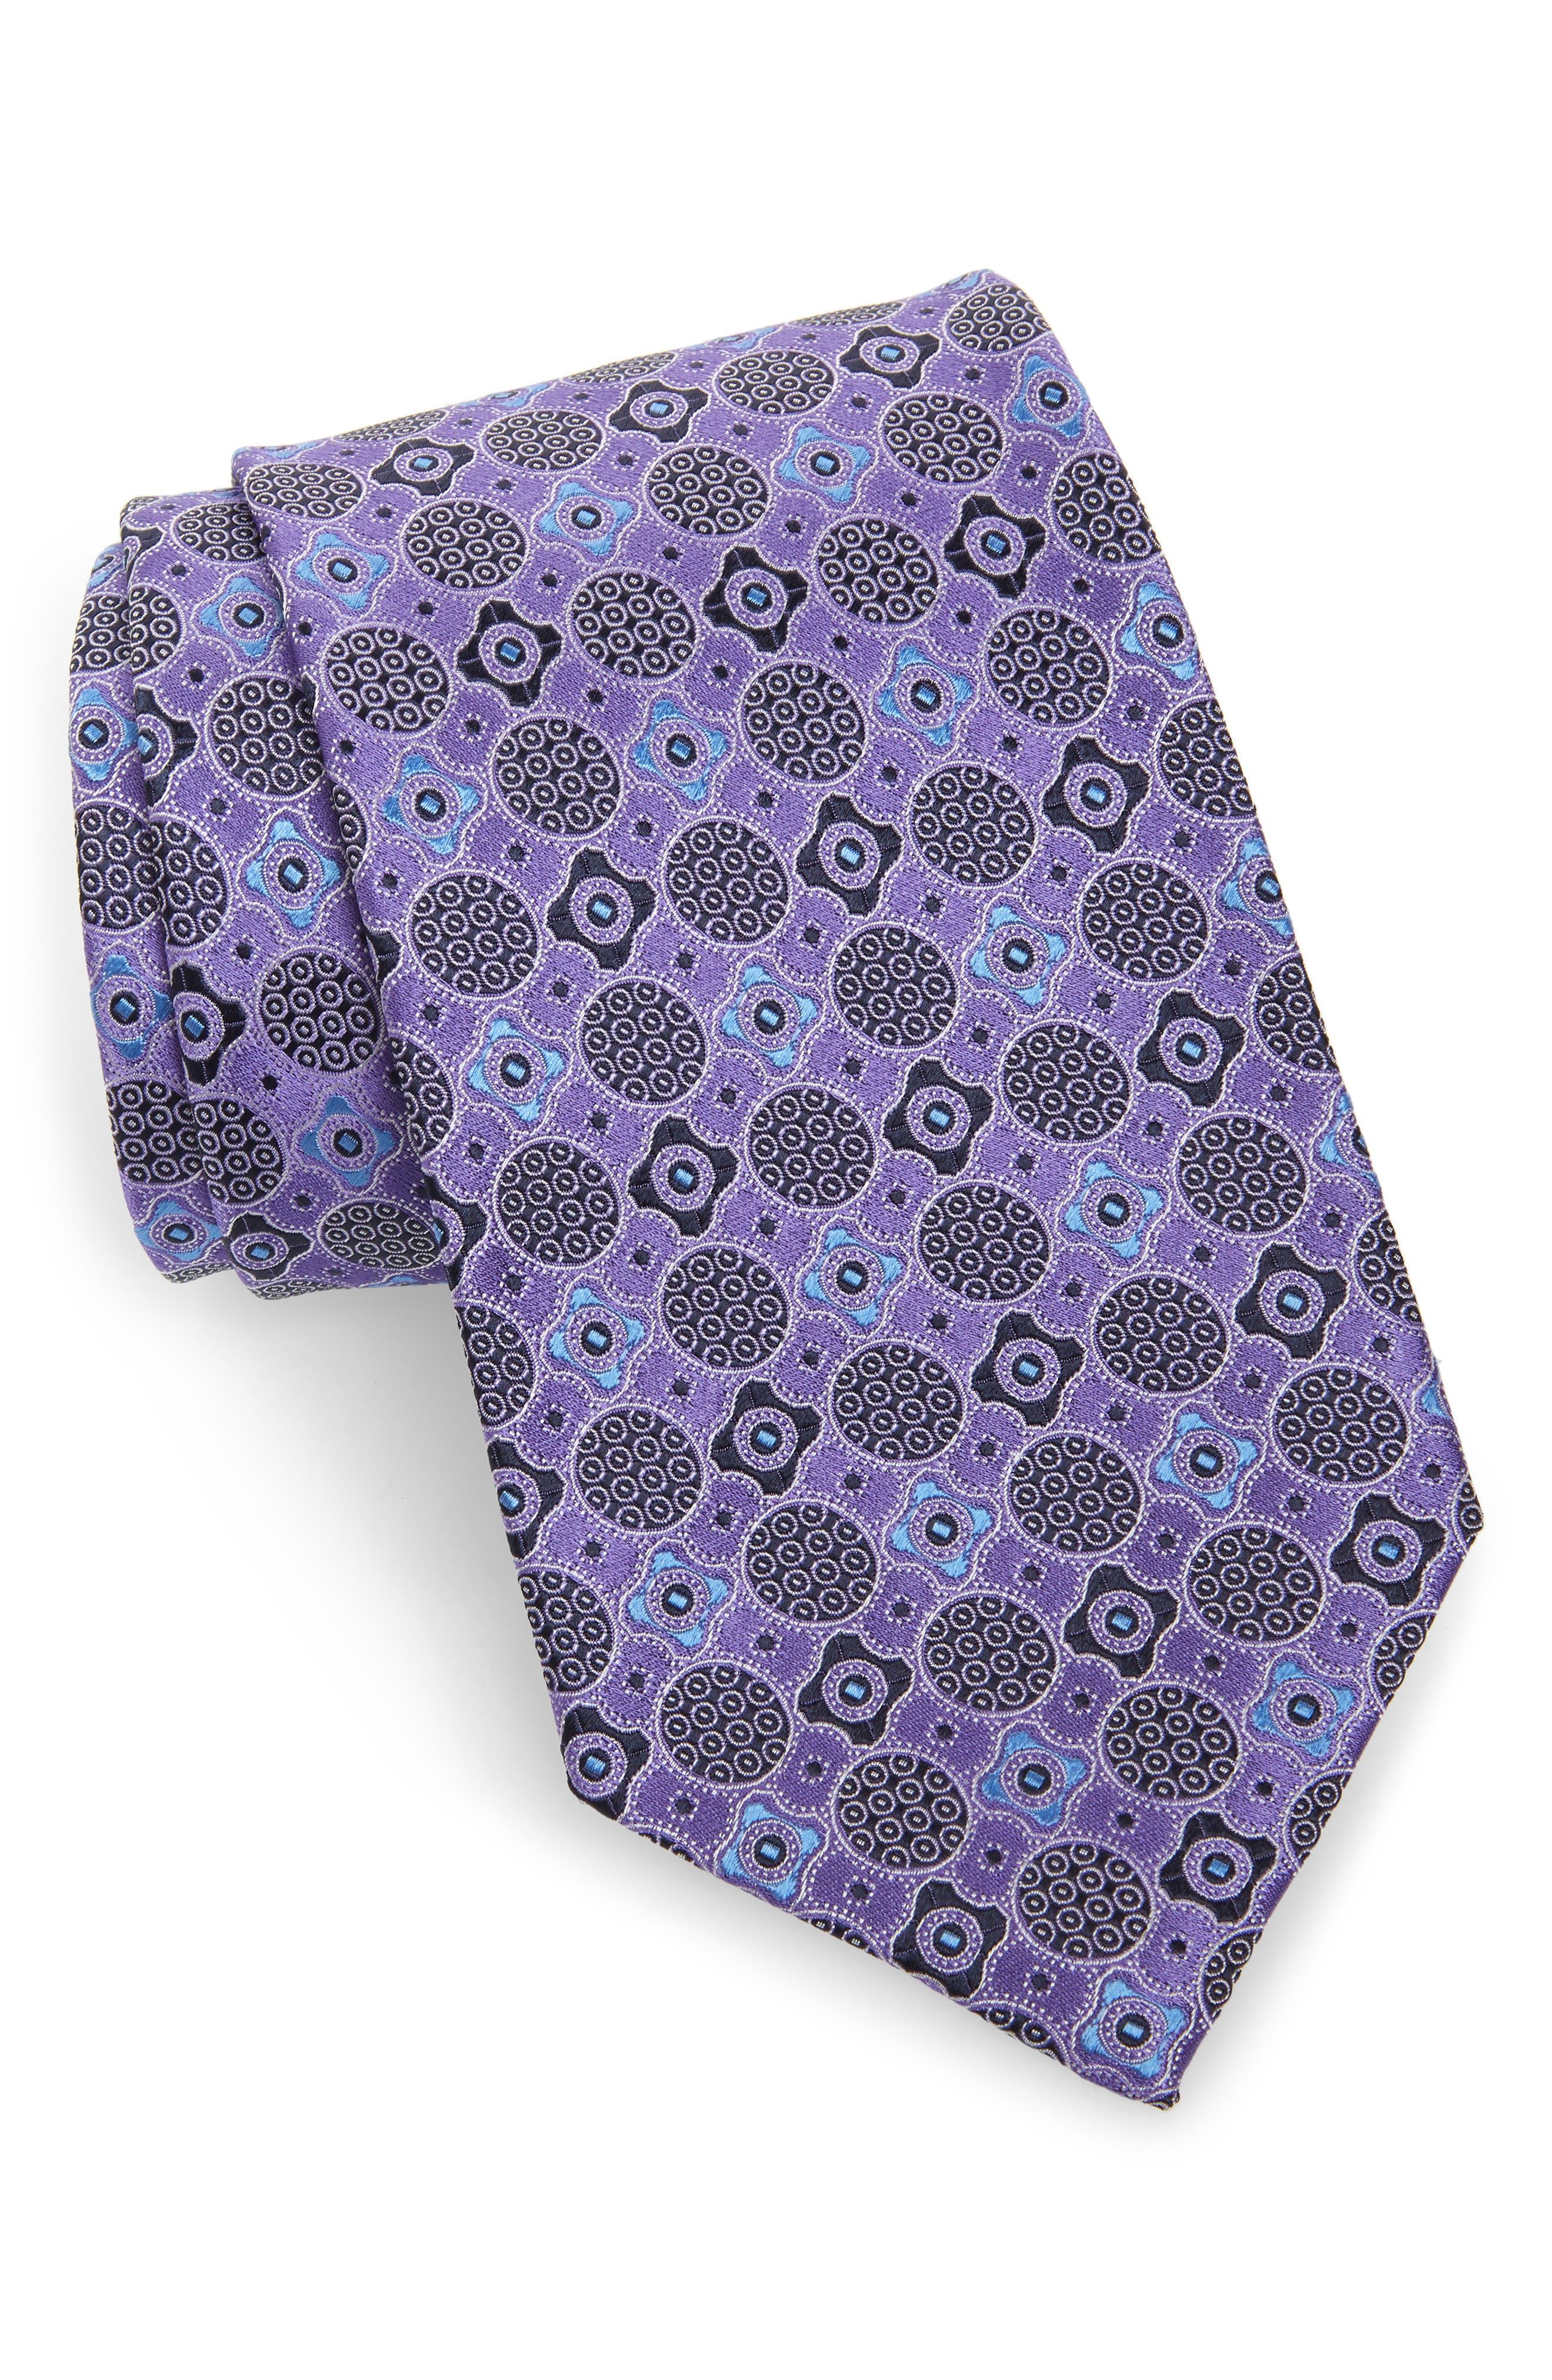 ERMENEGILDO ZEGNA Microfloral Medallion Silk Tie, Main, color, PURPLE